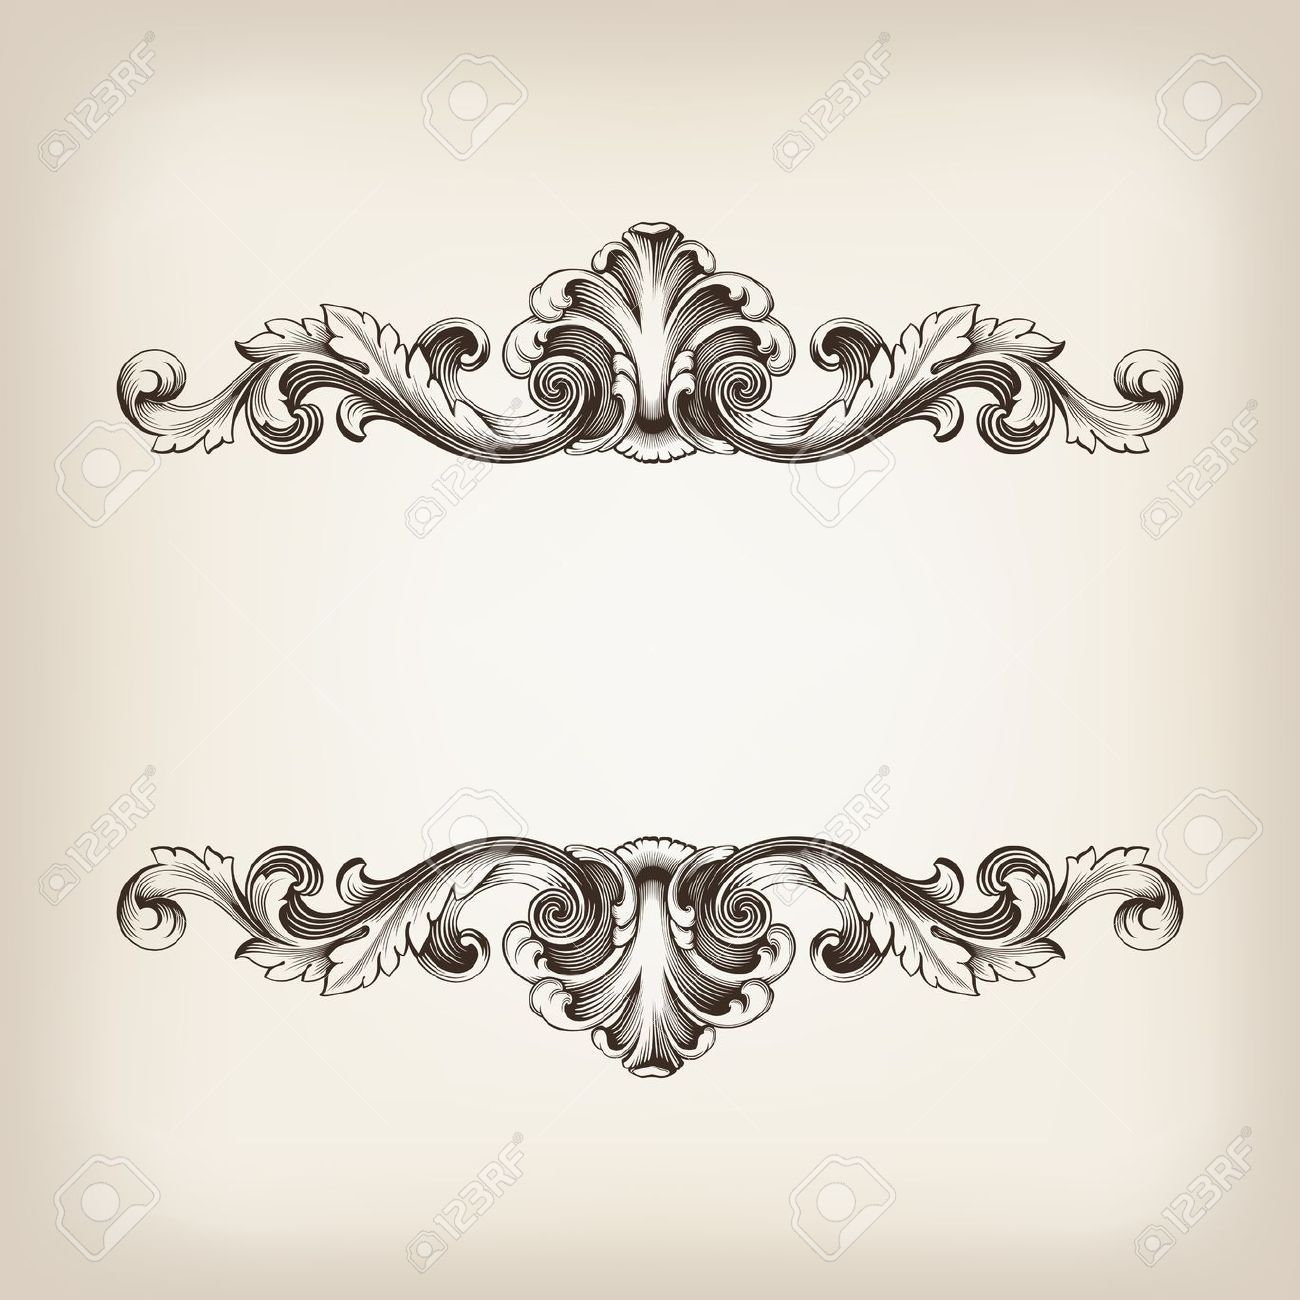 Vintage border frame filigree engraving with retro ornament ...